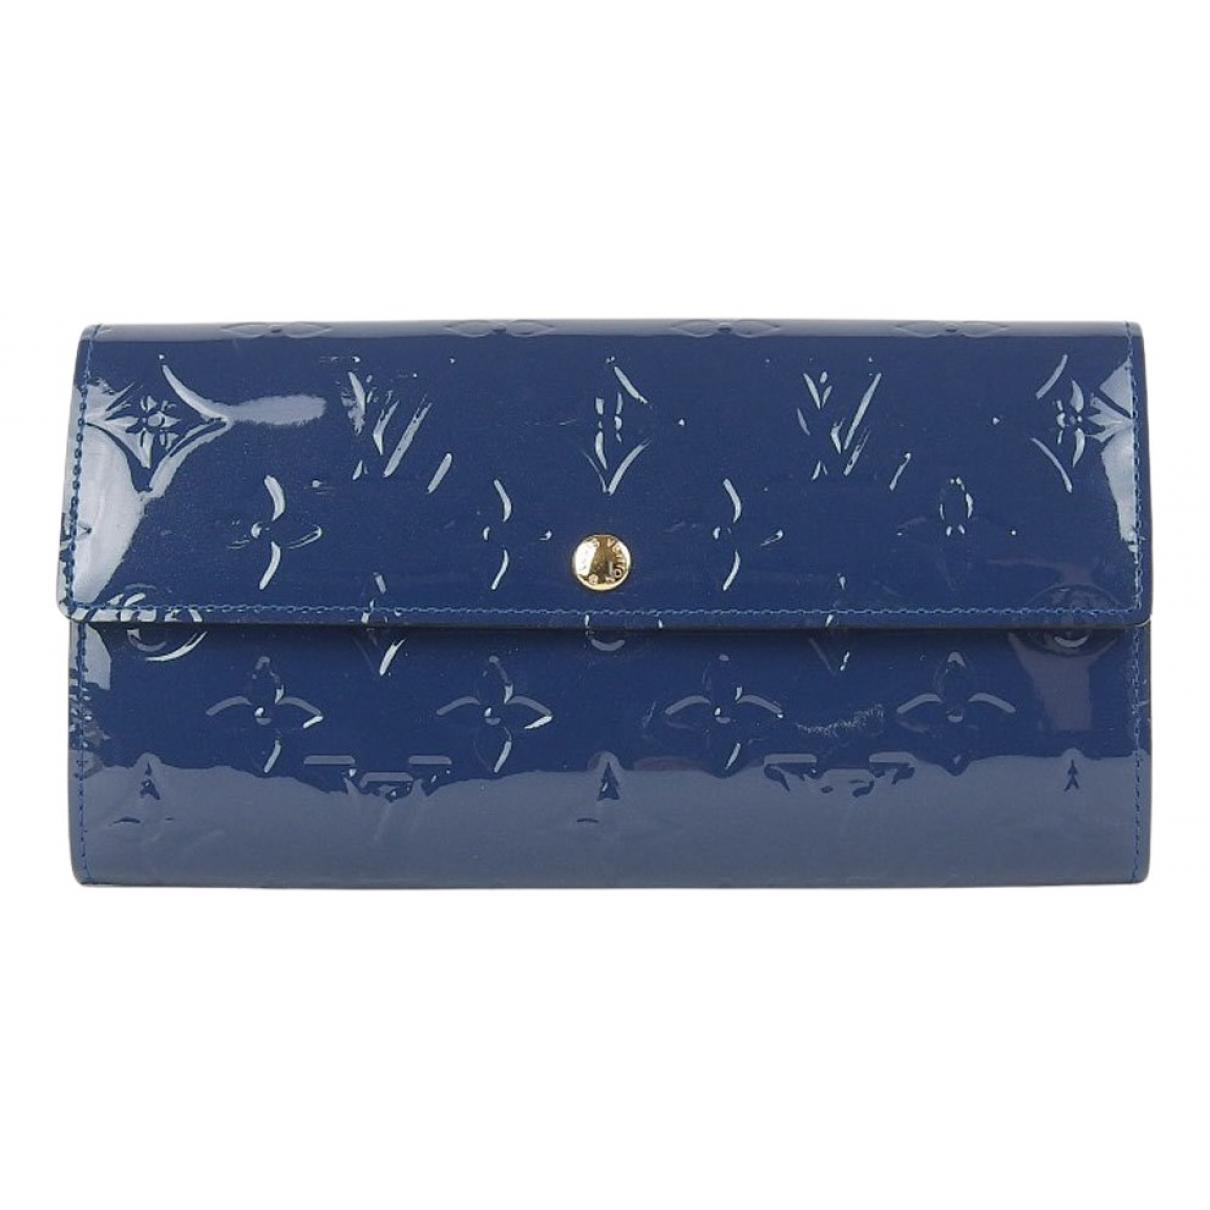 Louis Vuitton Sarah Portemonnaie in  Blau Lackleder